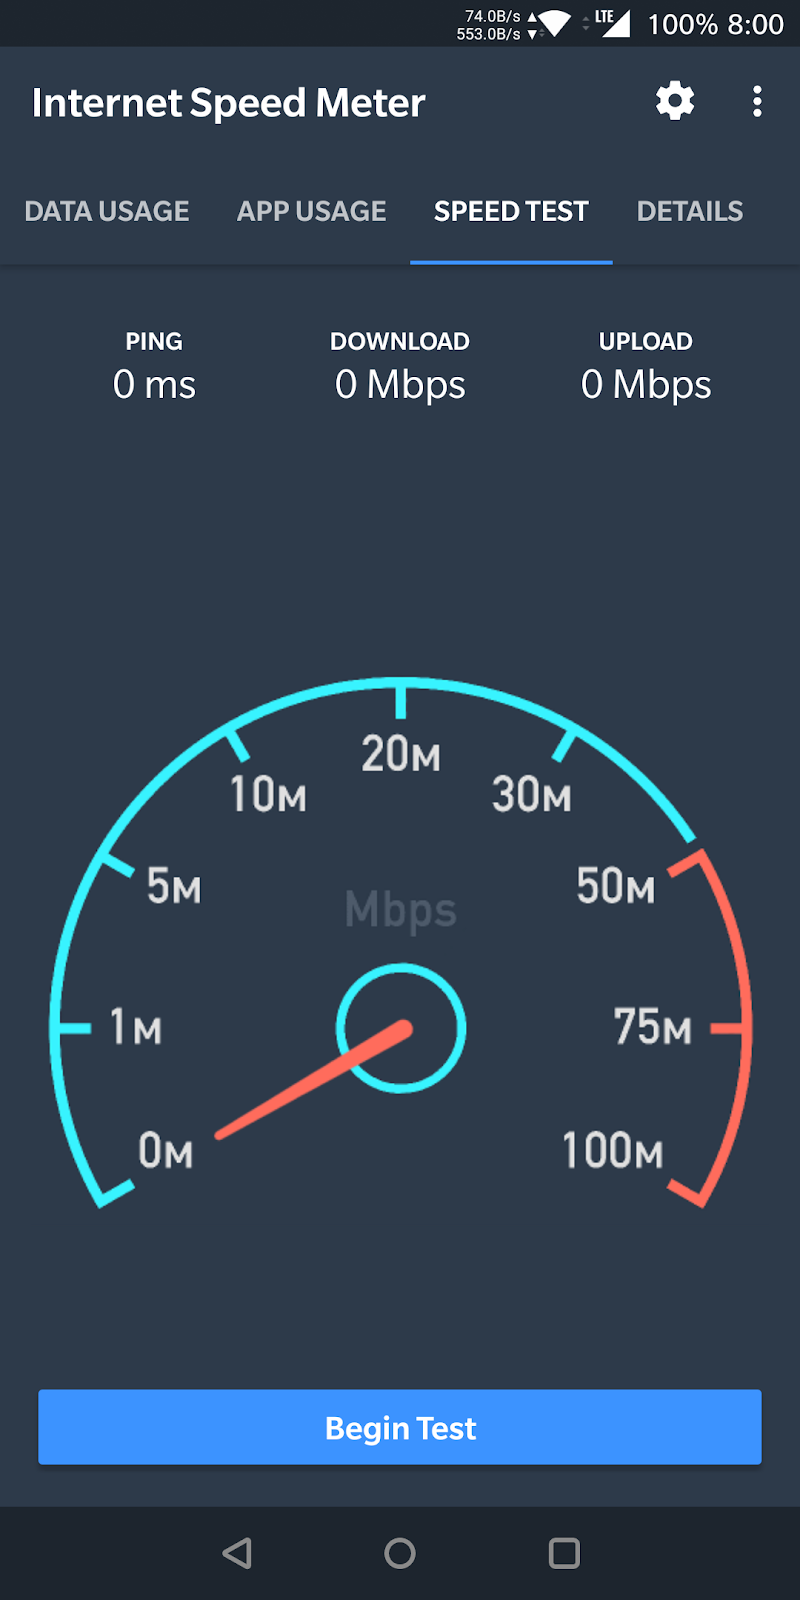 Internet Speed Meter Screenshot 1